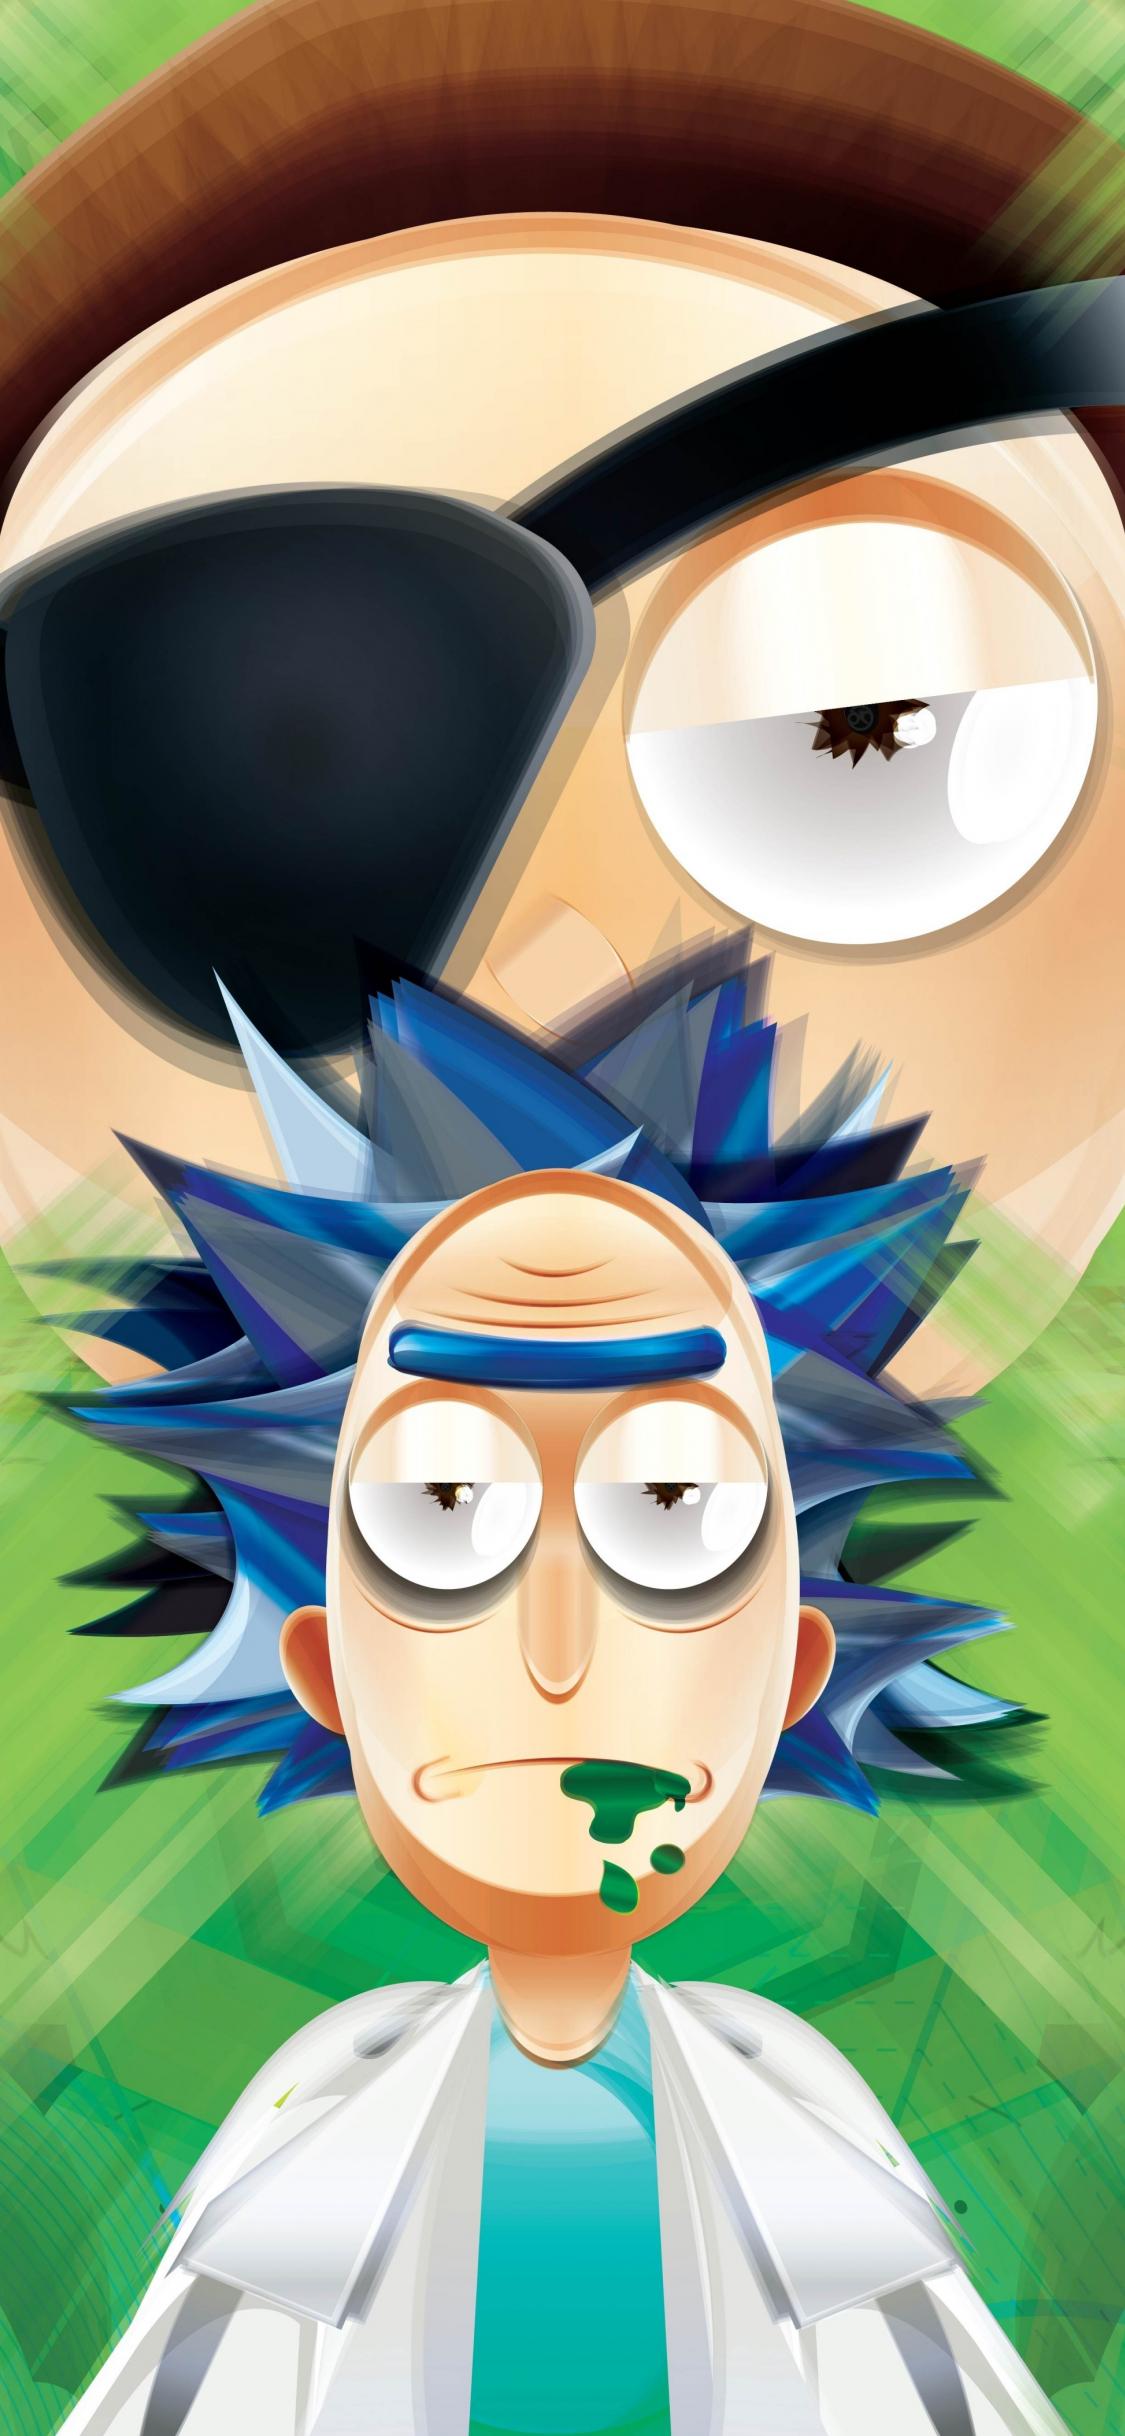 Download 1125x2436 Wallpaper Rick And Morty 2018 Vector